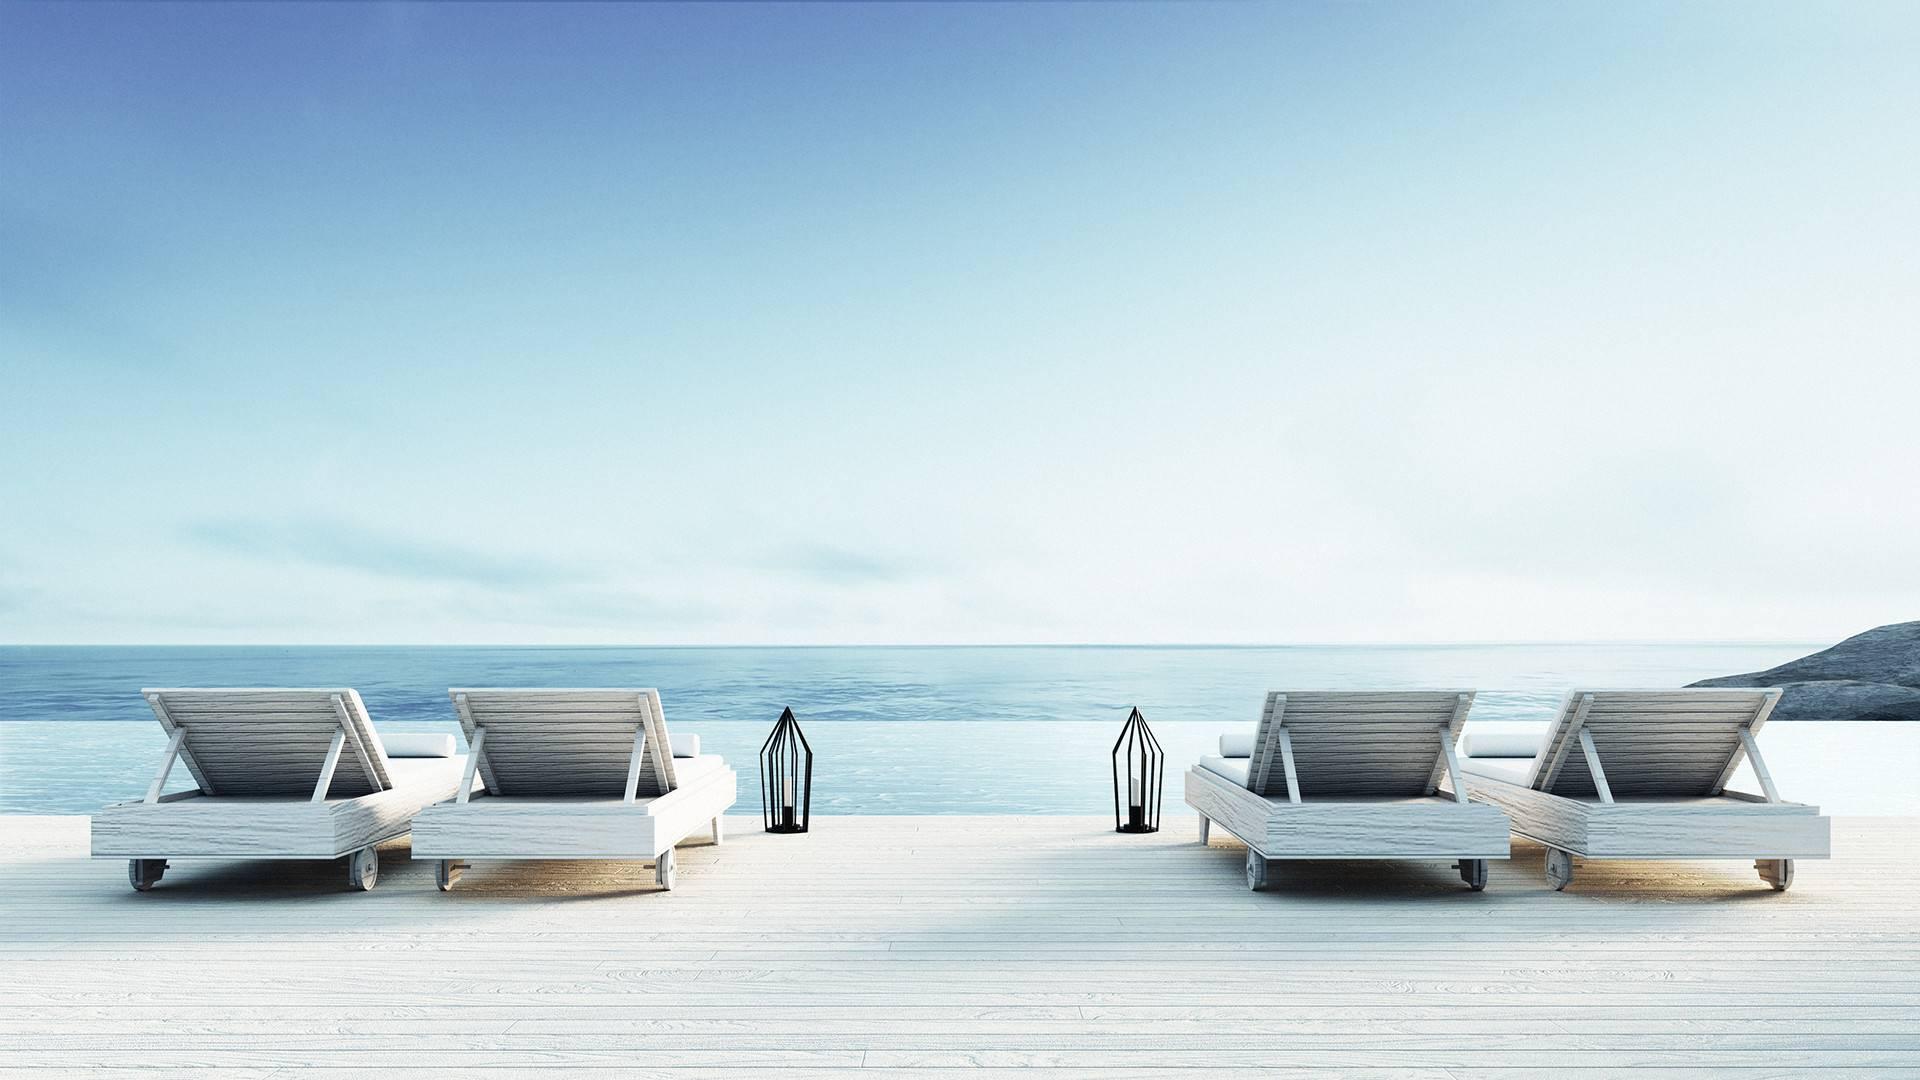 Hotel Lovers: H Σαντορίνη υποδέχεται το πρώτο Hilton ξενοδοχείο